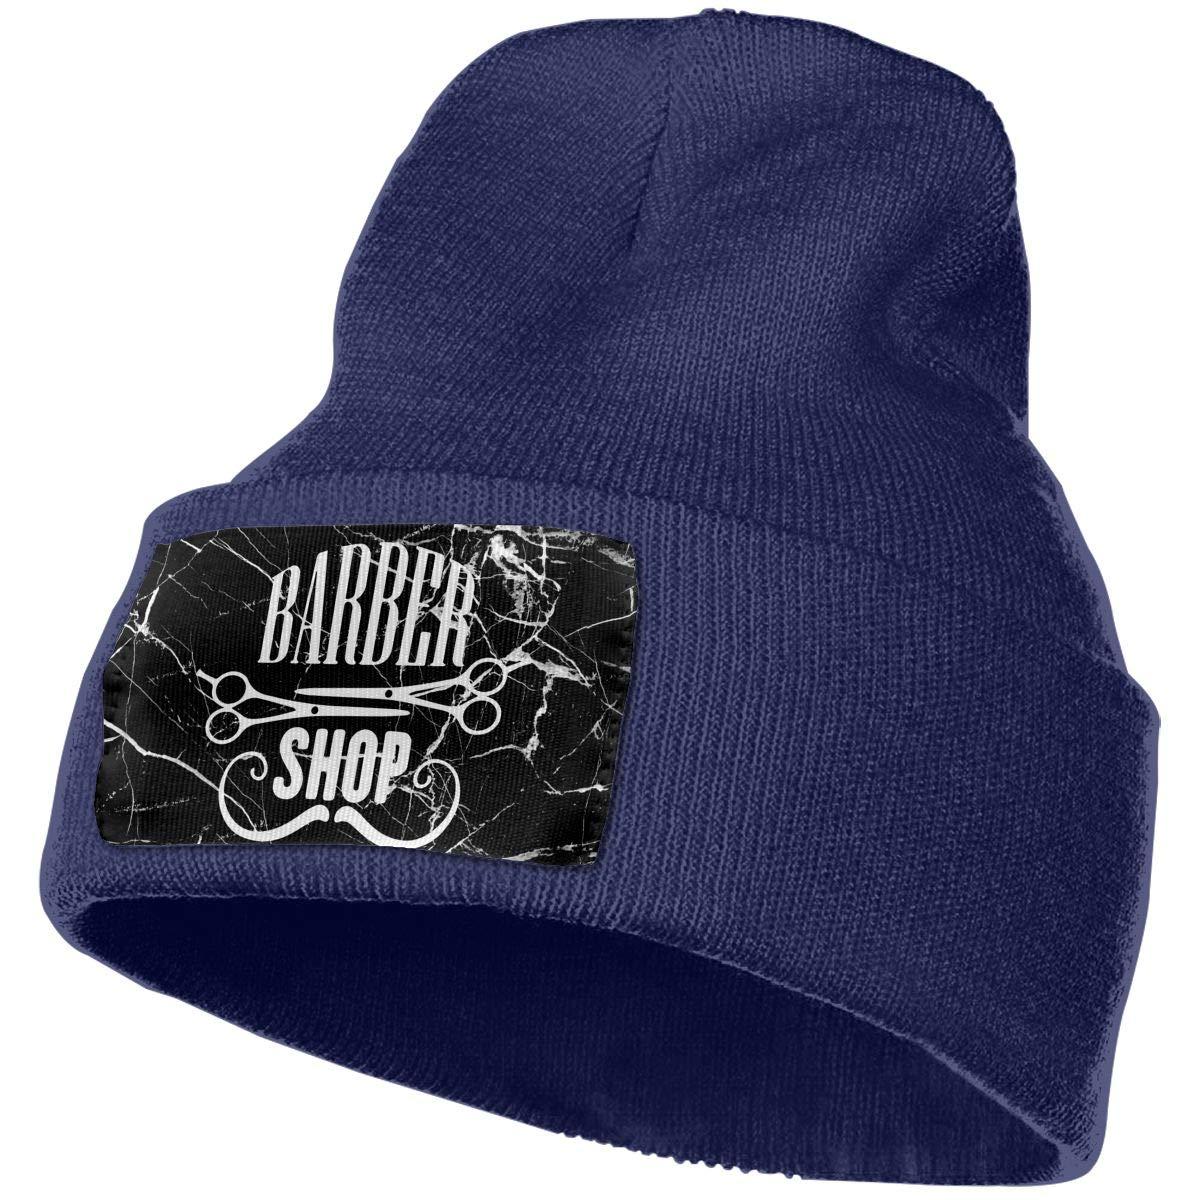 Barber Shop Skull Cap Men /& Women Knit Hats Stretchy /& Soft Beanie